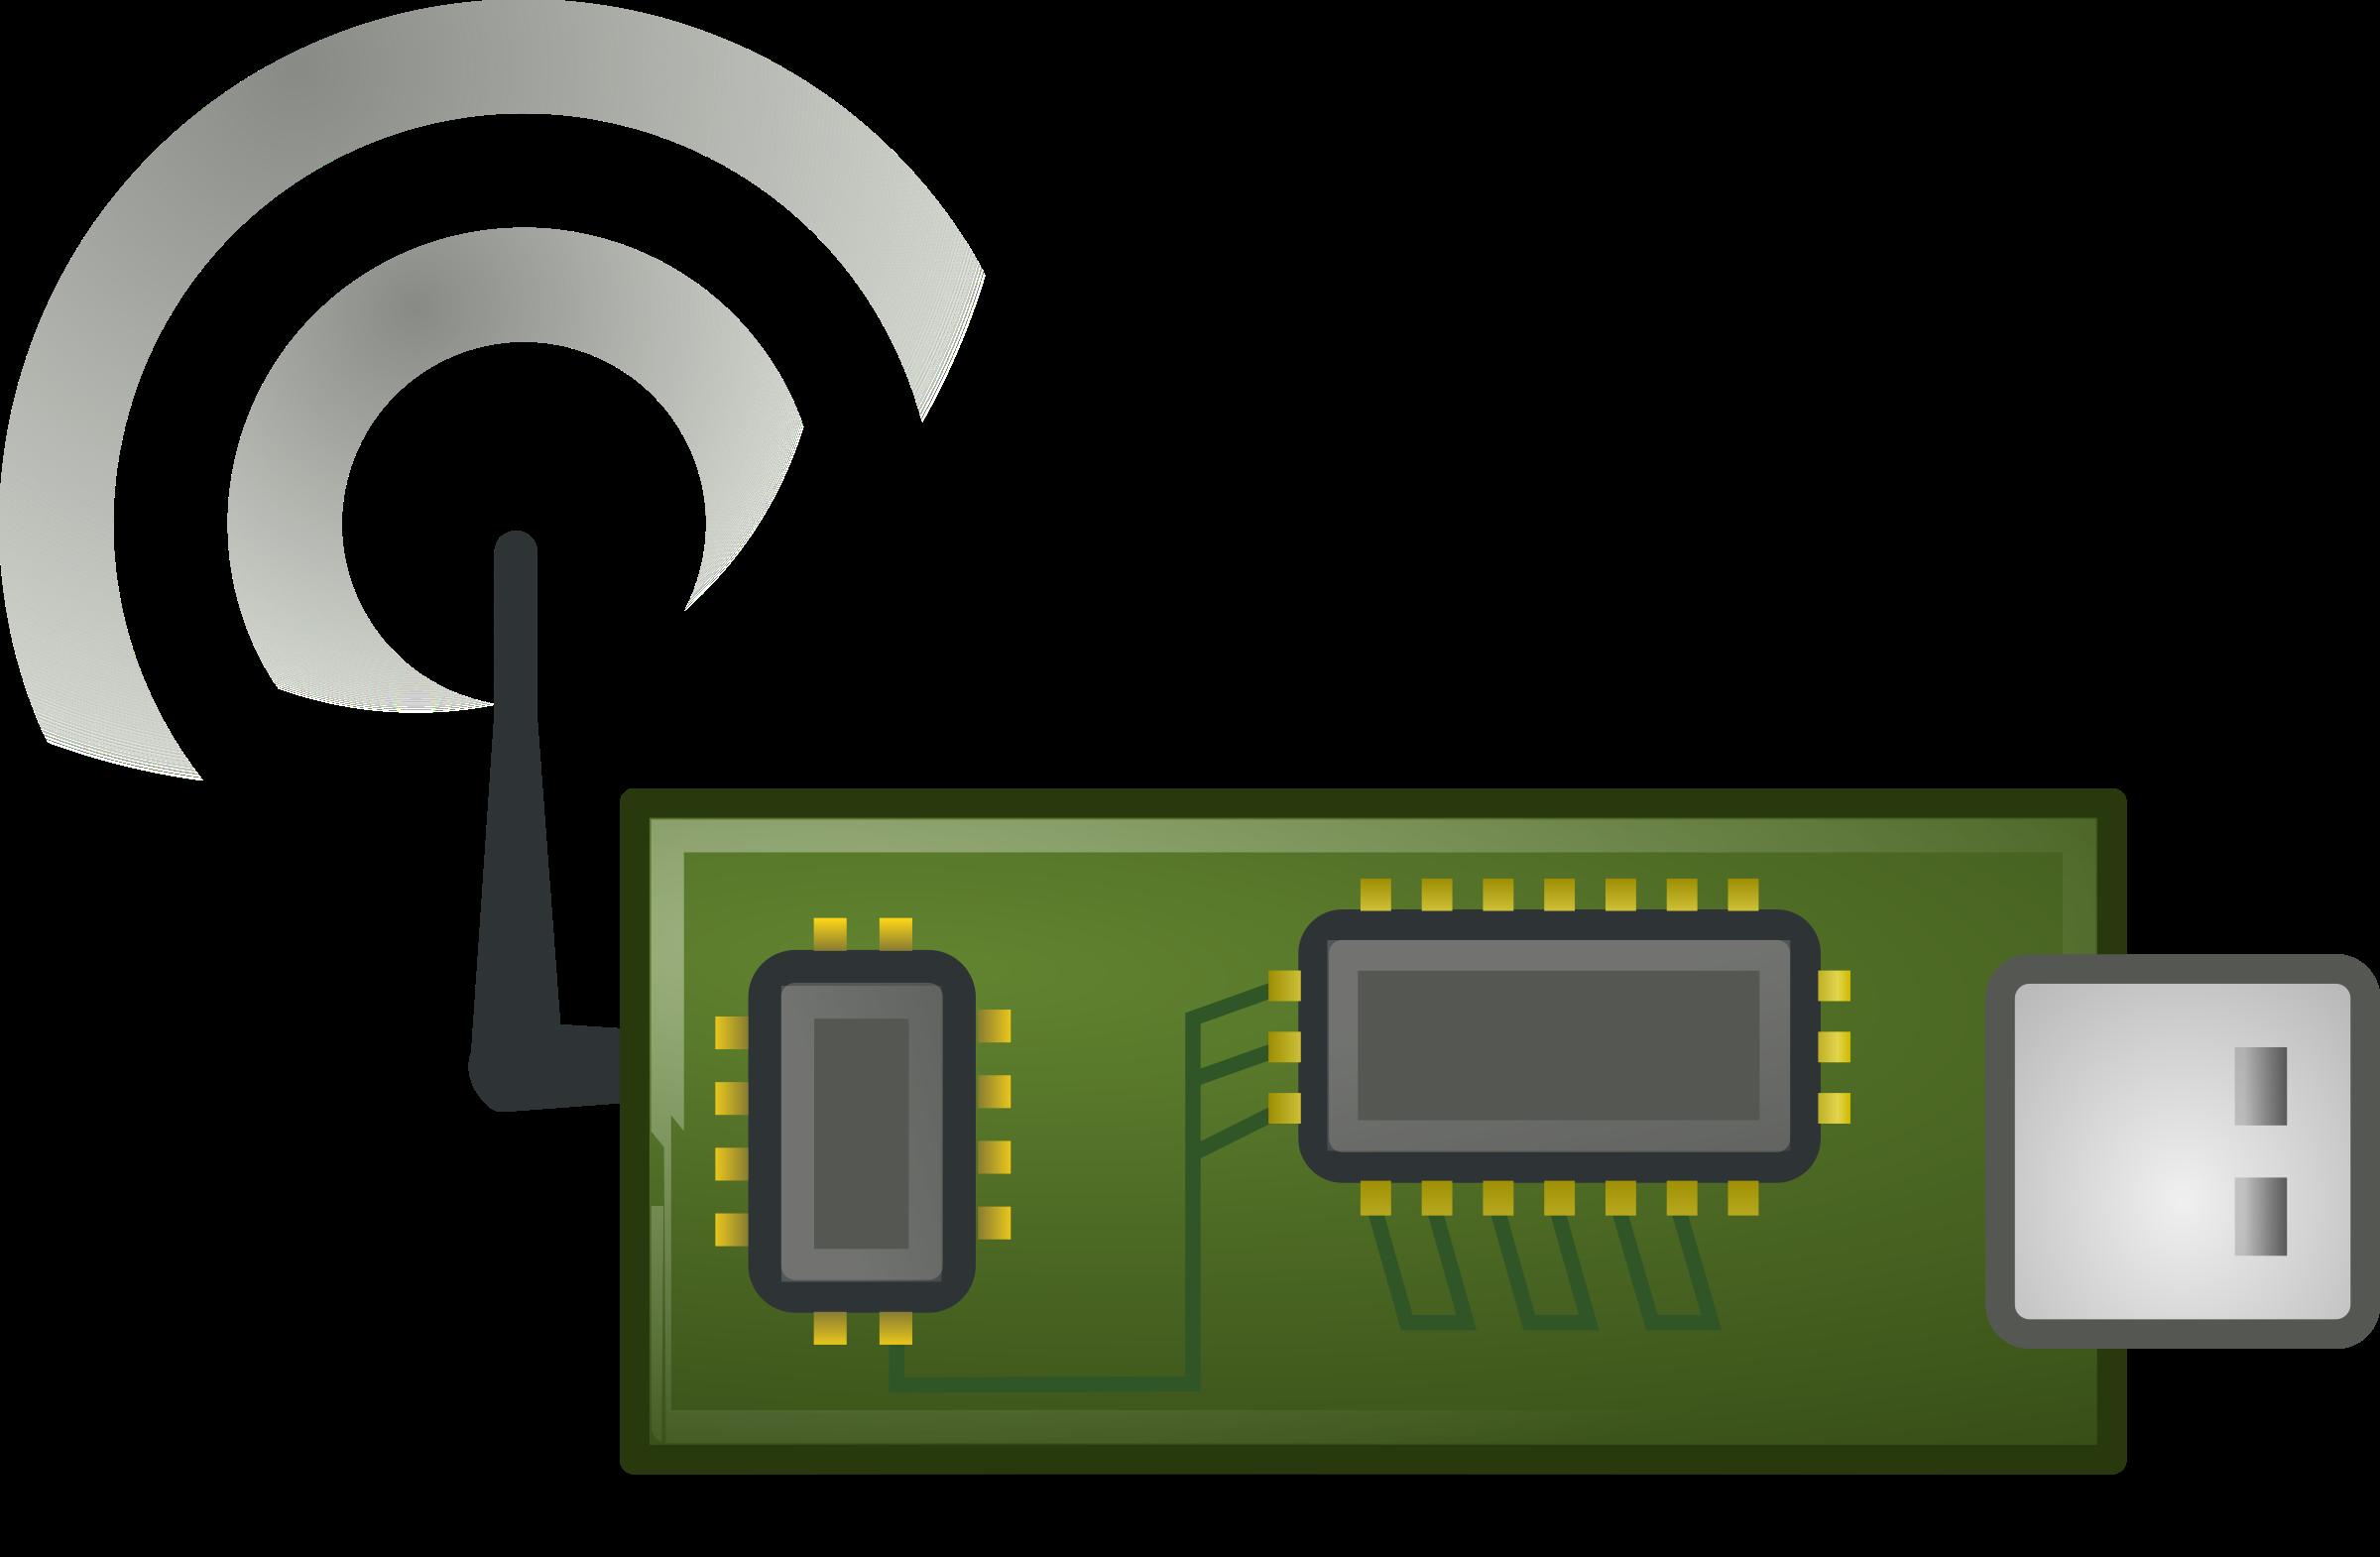 Wireless sensor network node simulation dating 10